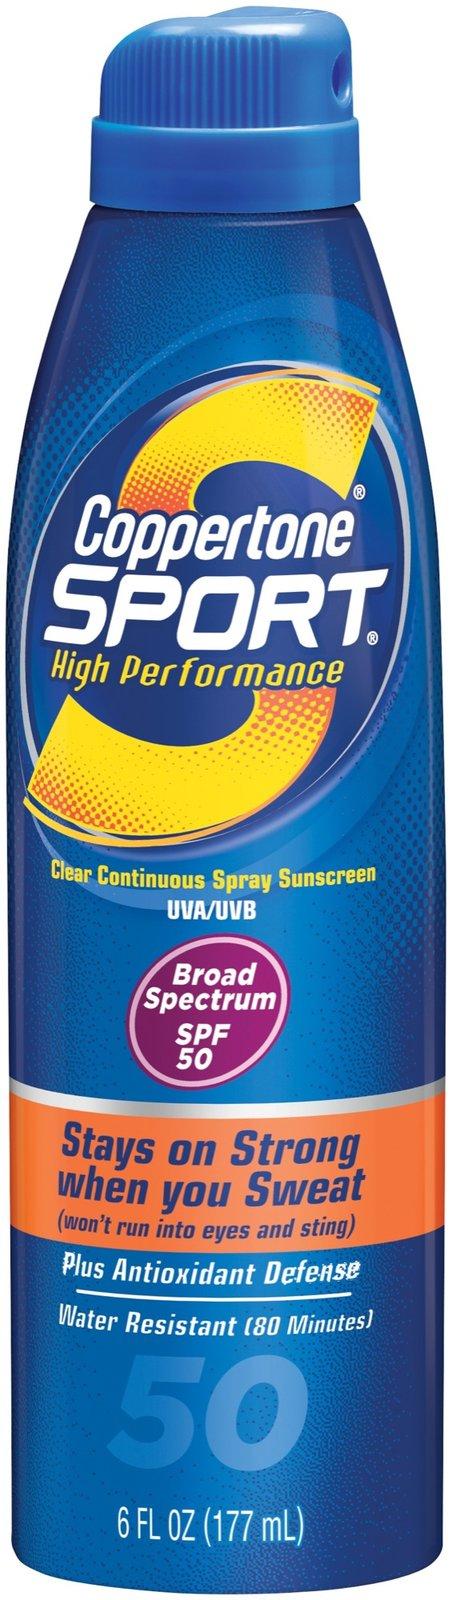 0330e9a99a65 Coppertone Sport High Performance Sunscreen Continuous Spray, SPF 50 ...